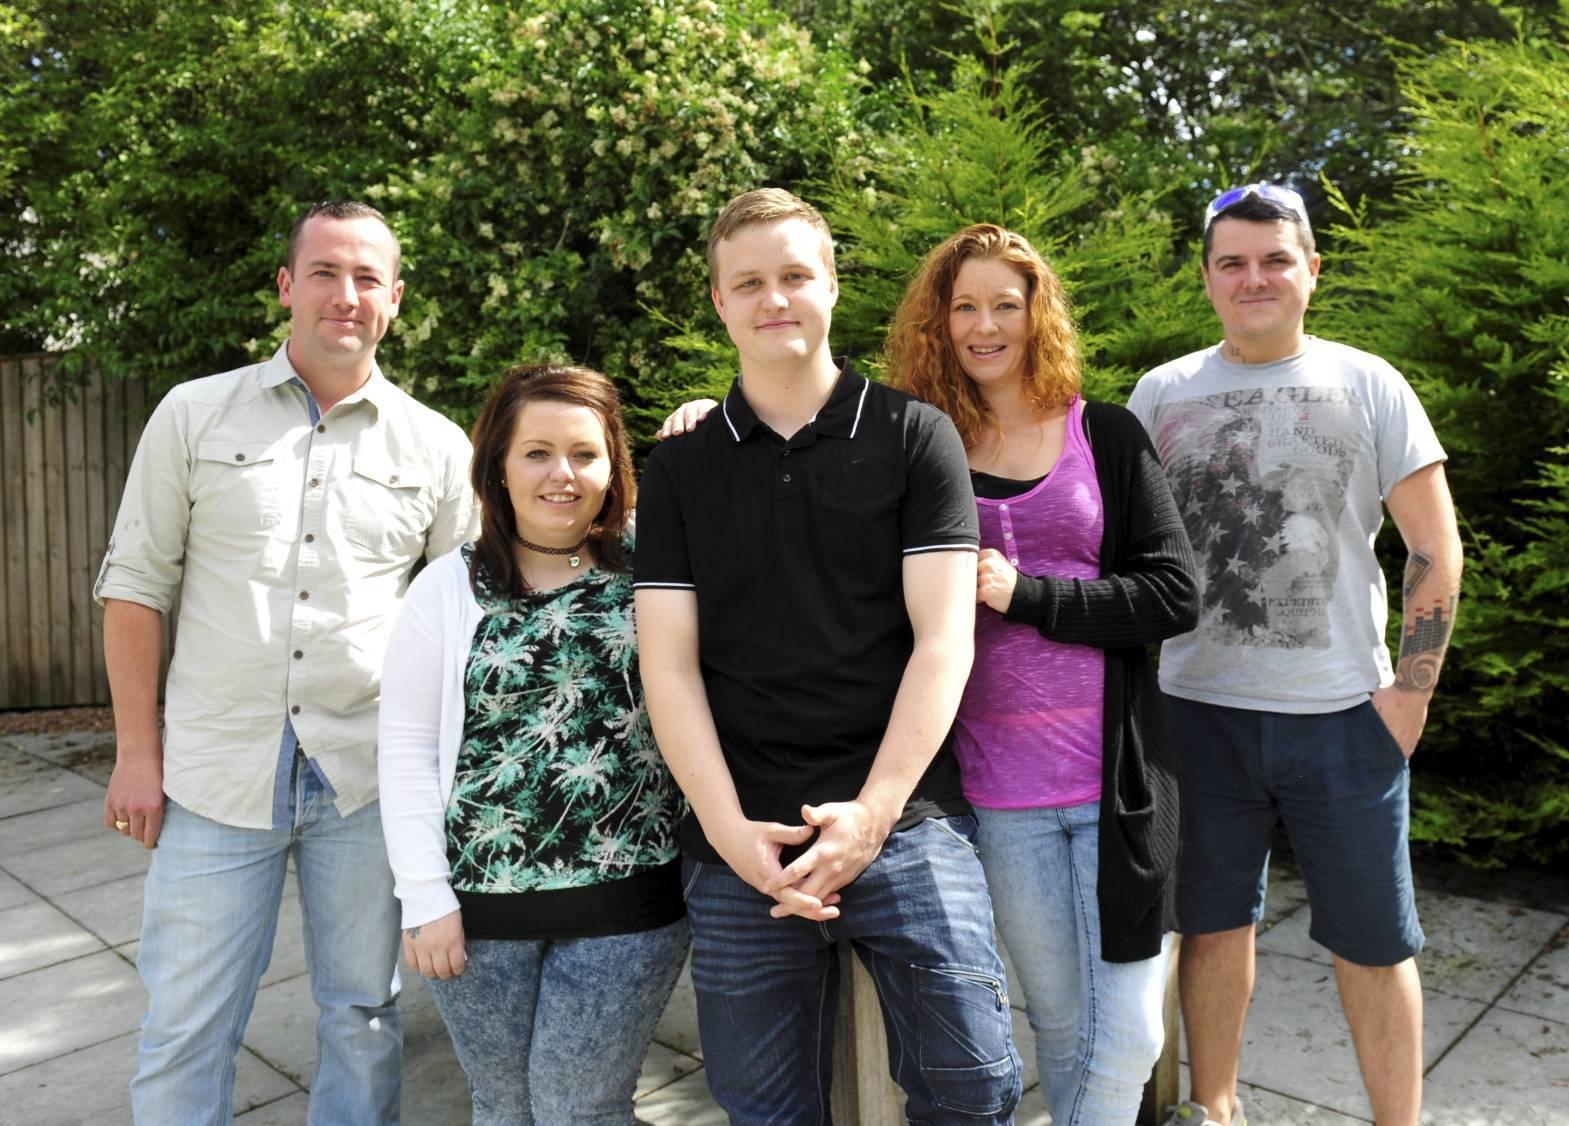 Pictured from left are Jonathan Radley, Emma Will, Brandon Reid, Jennifer Reid and Charlie Duthie.